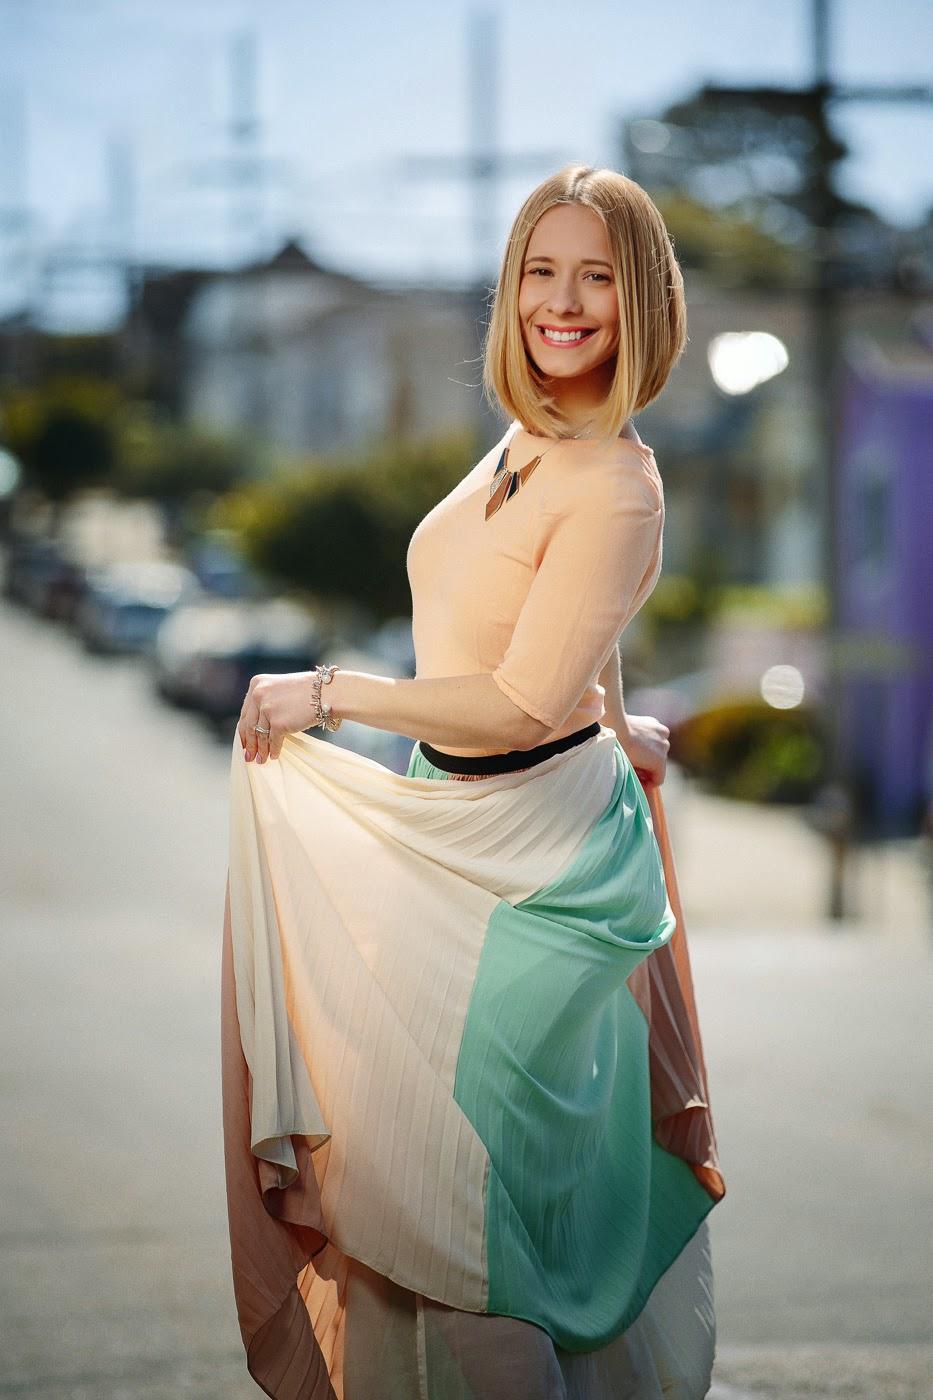 San Francisco Fashion Blogger